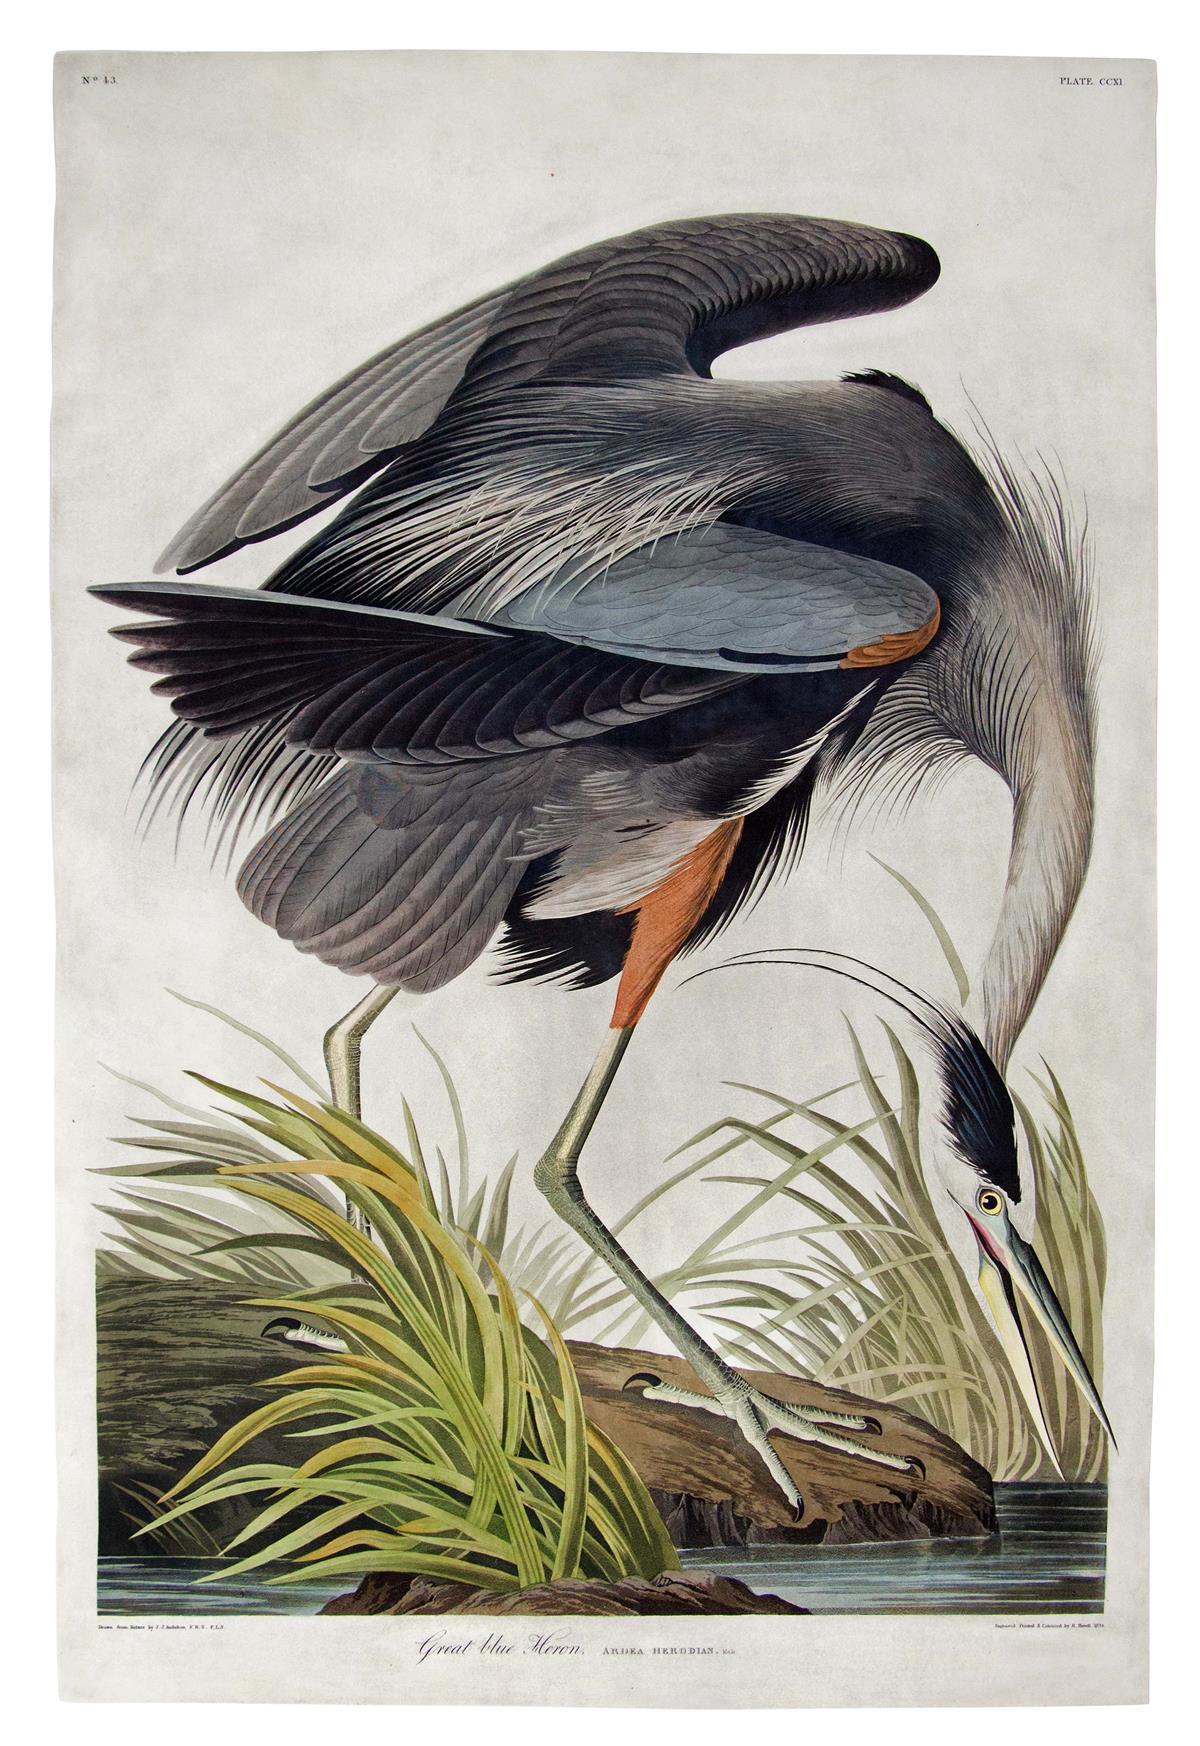 AUDUBON, JOHN JAMES. Great Blue Heron. Plate CCXI.